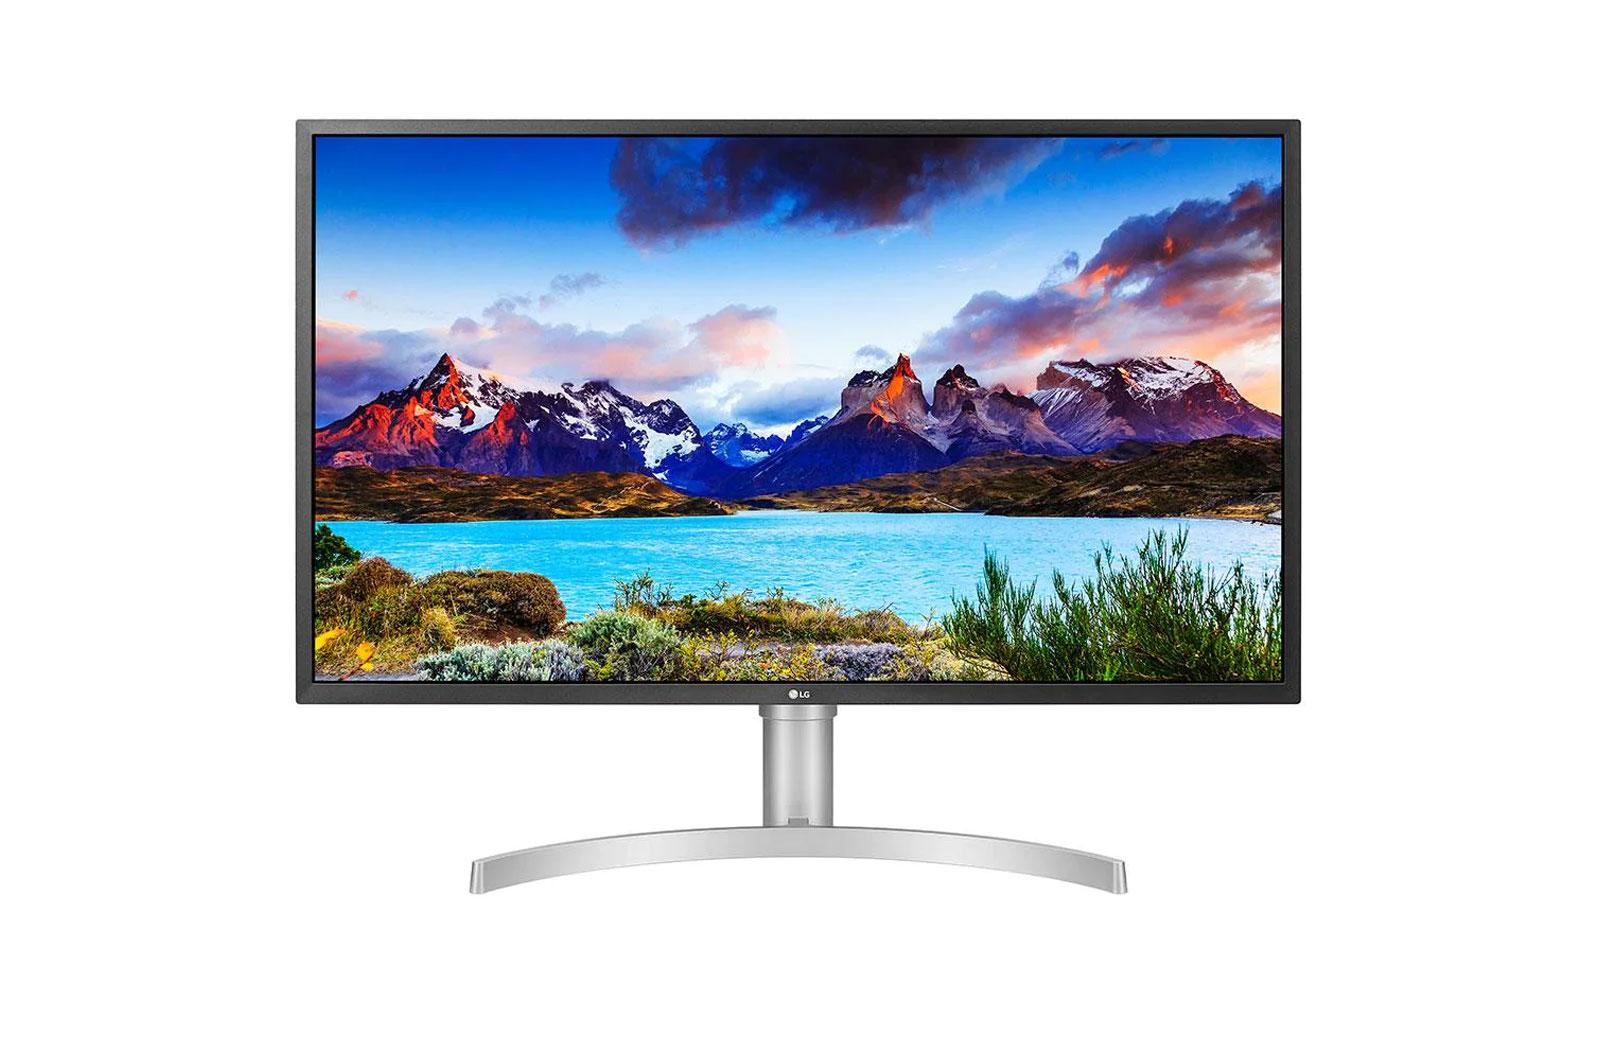 LG 32' 5Ms 60Hz Class 4K UHD LED Monitor with VESA Display HDR 600 (31.5'' Diagonal) VESA 100x100  USB C , 2xHDMI, DP